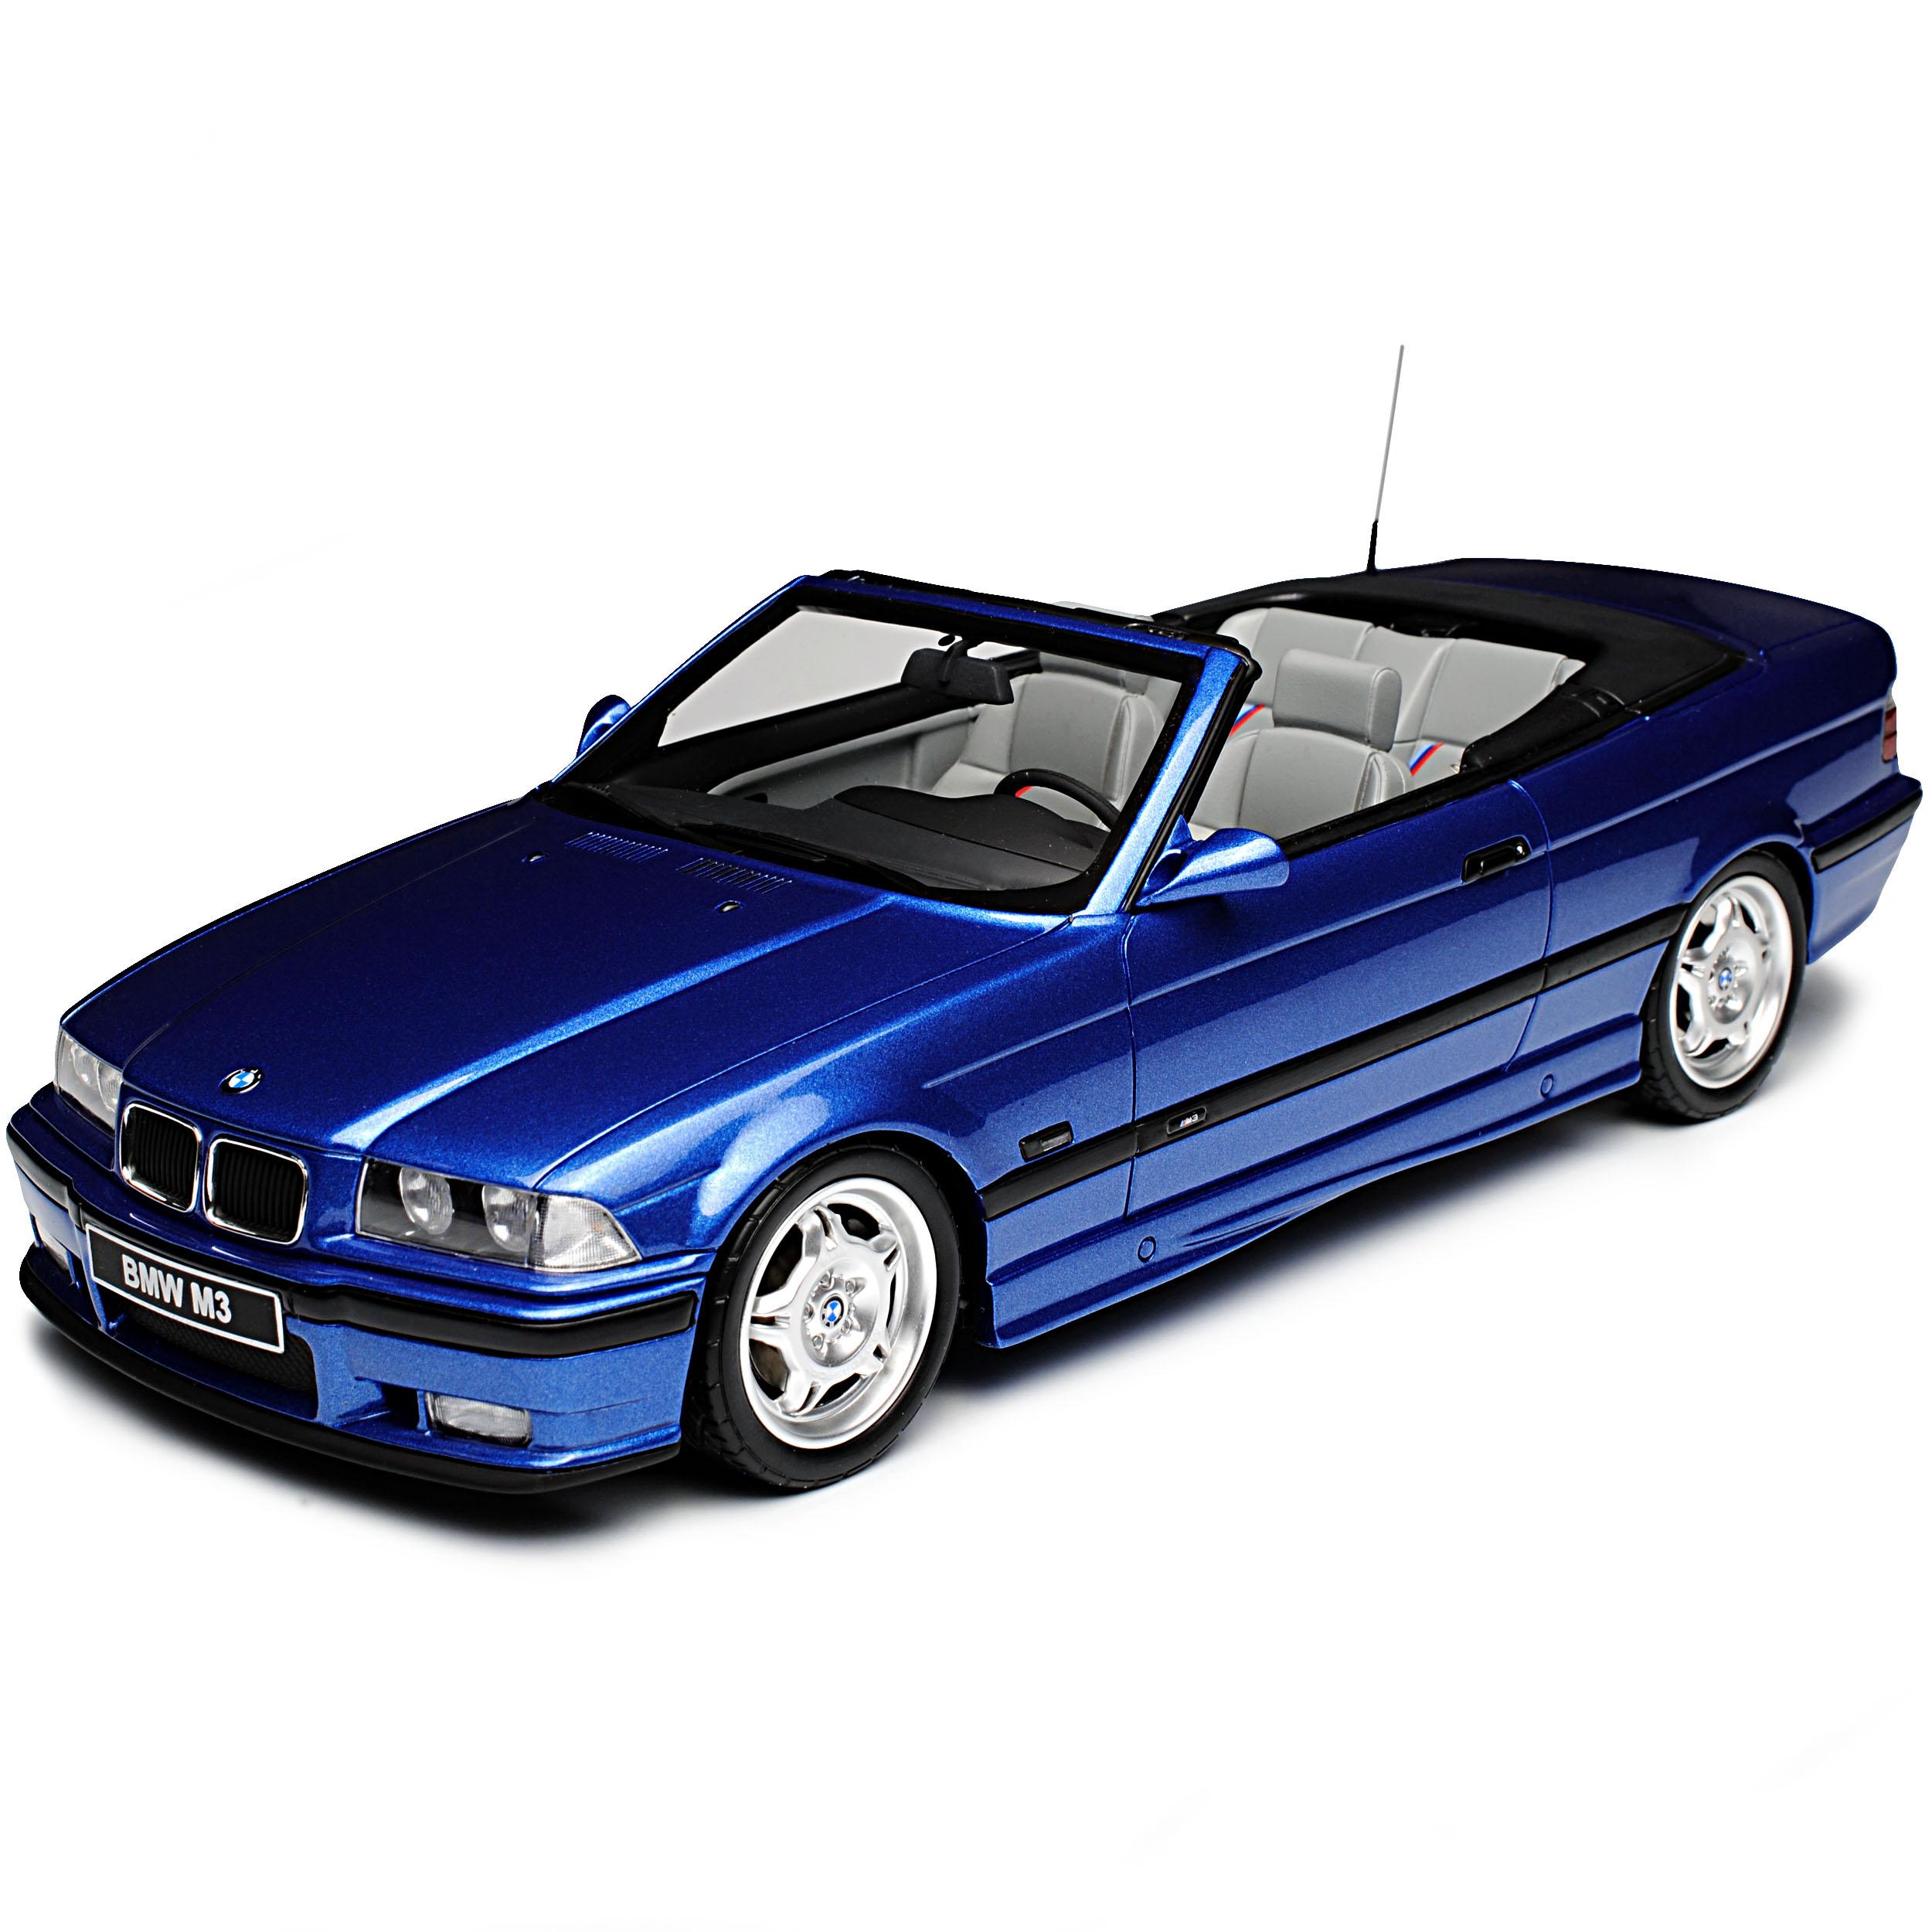 BMW 3er E36 M3 Convertible Blue 1990-2000 NR 279 1/18 Otto